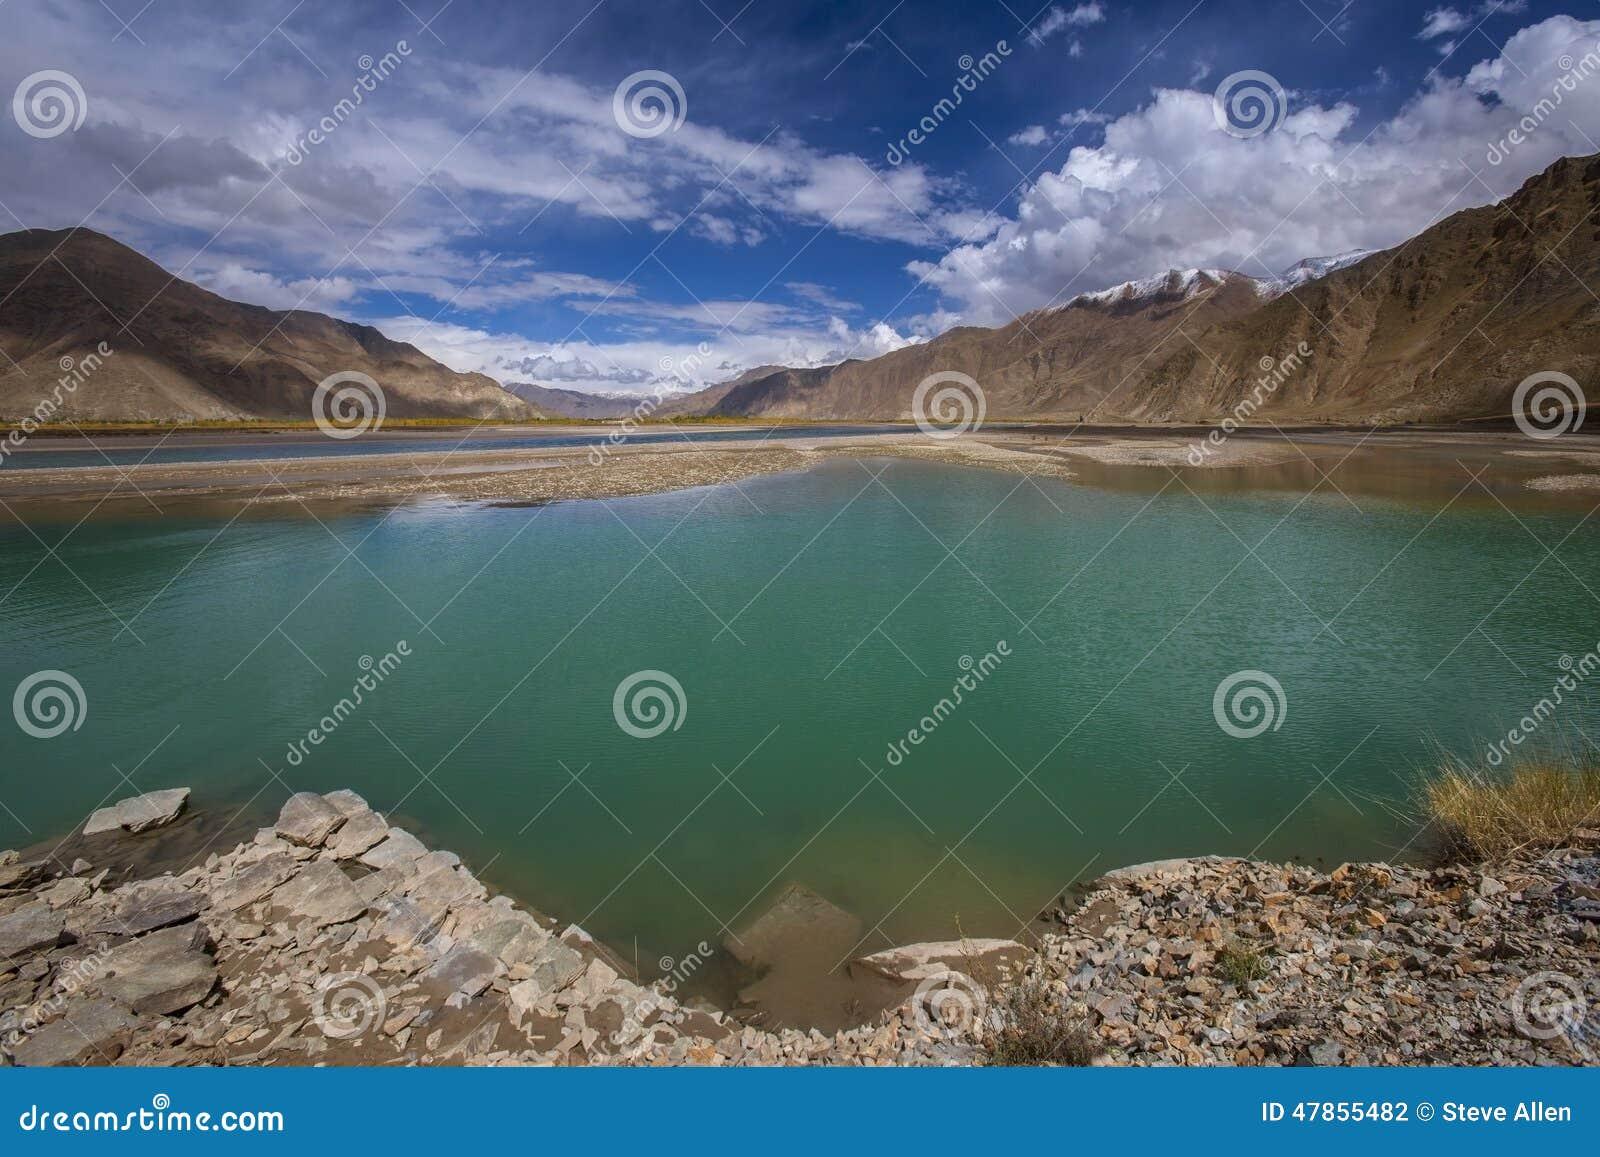 Река Brahmaputra - Тибет - Китай